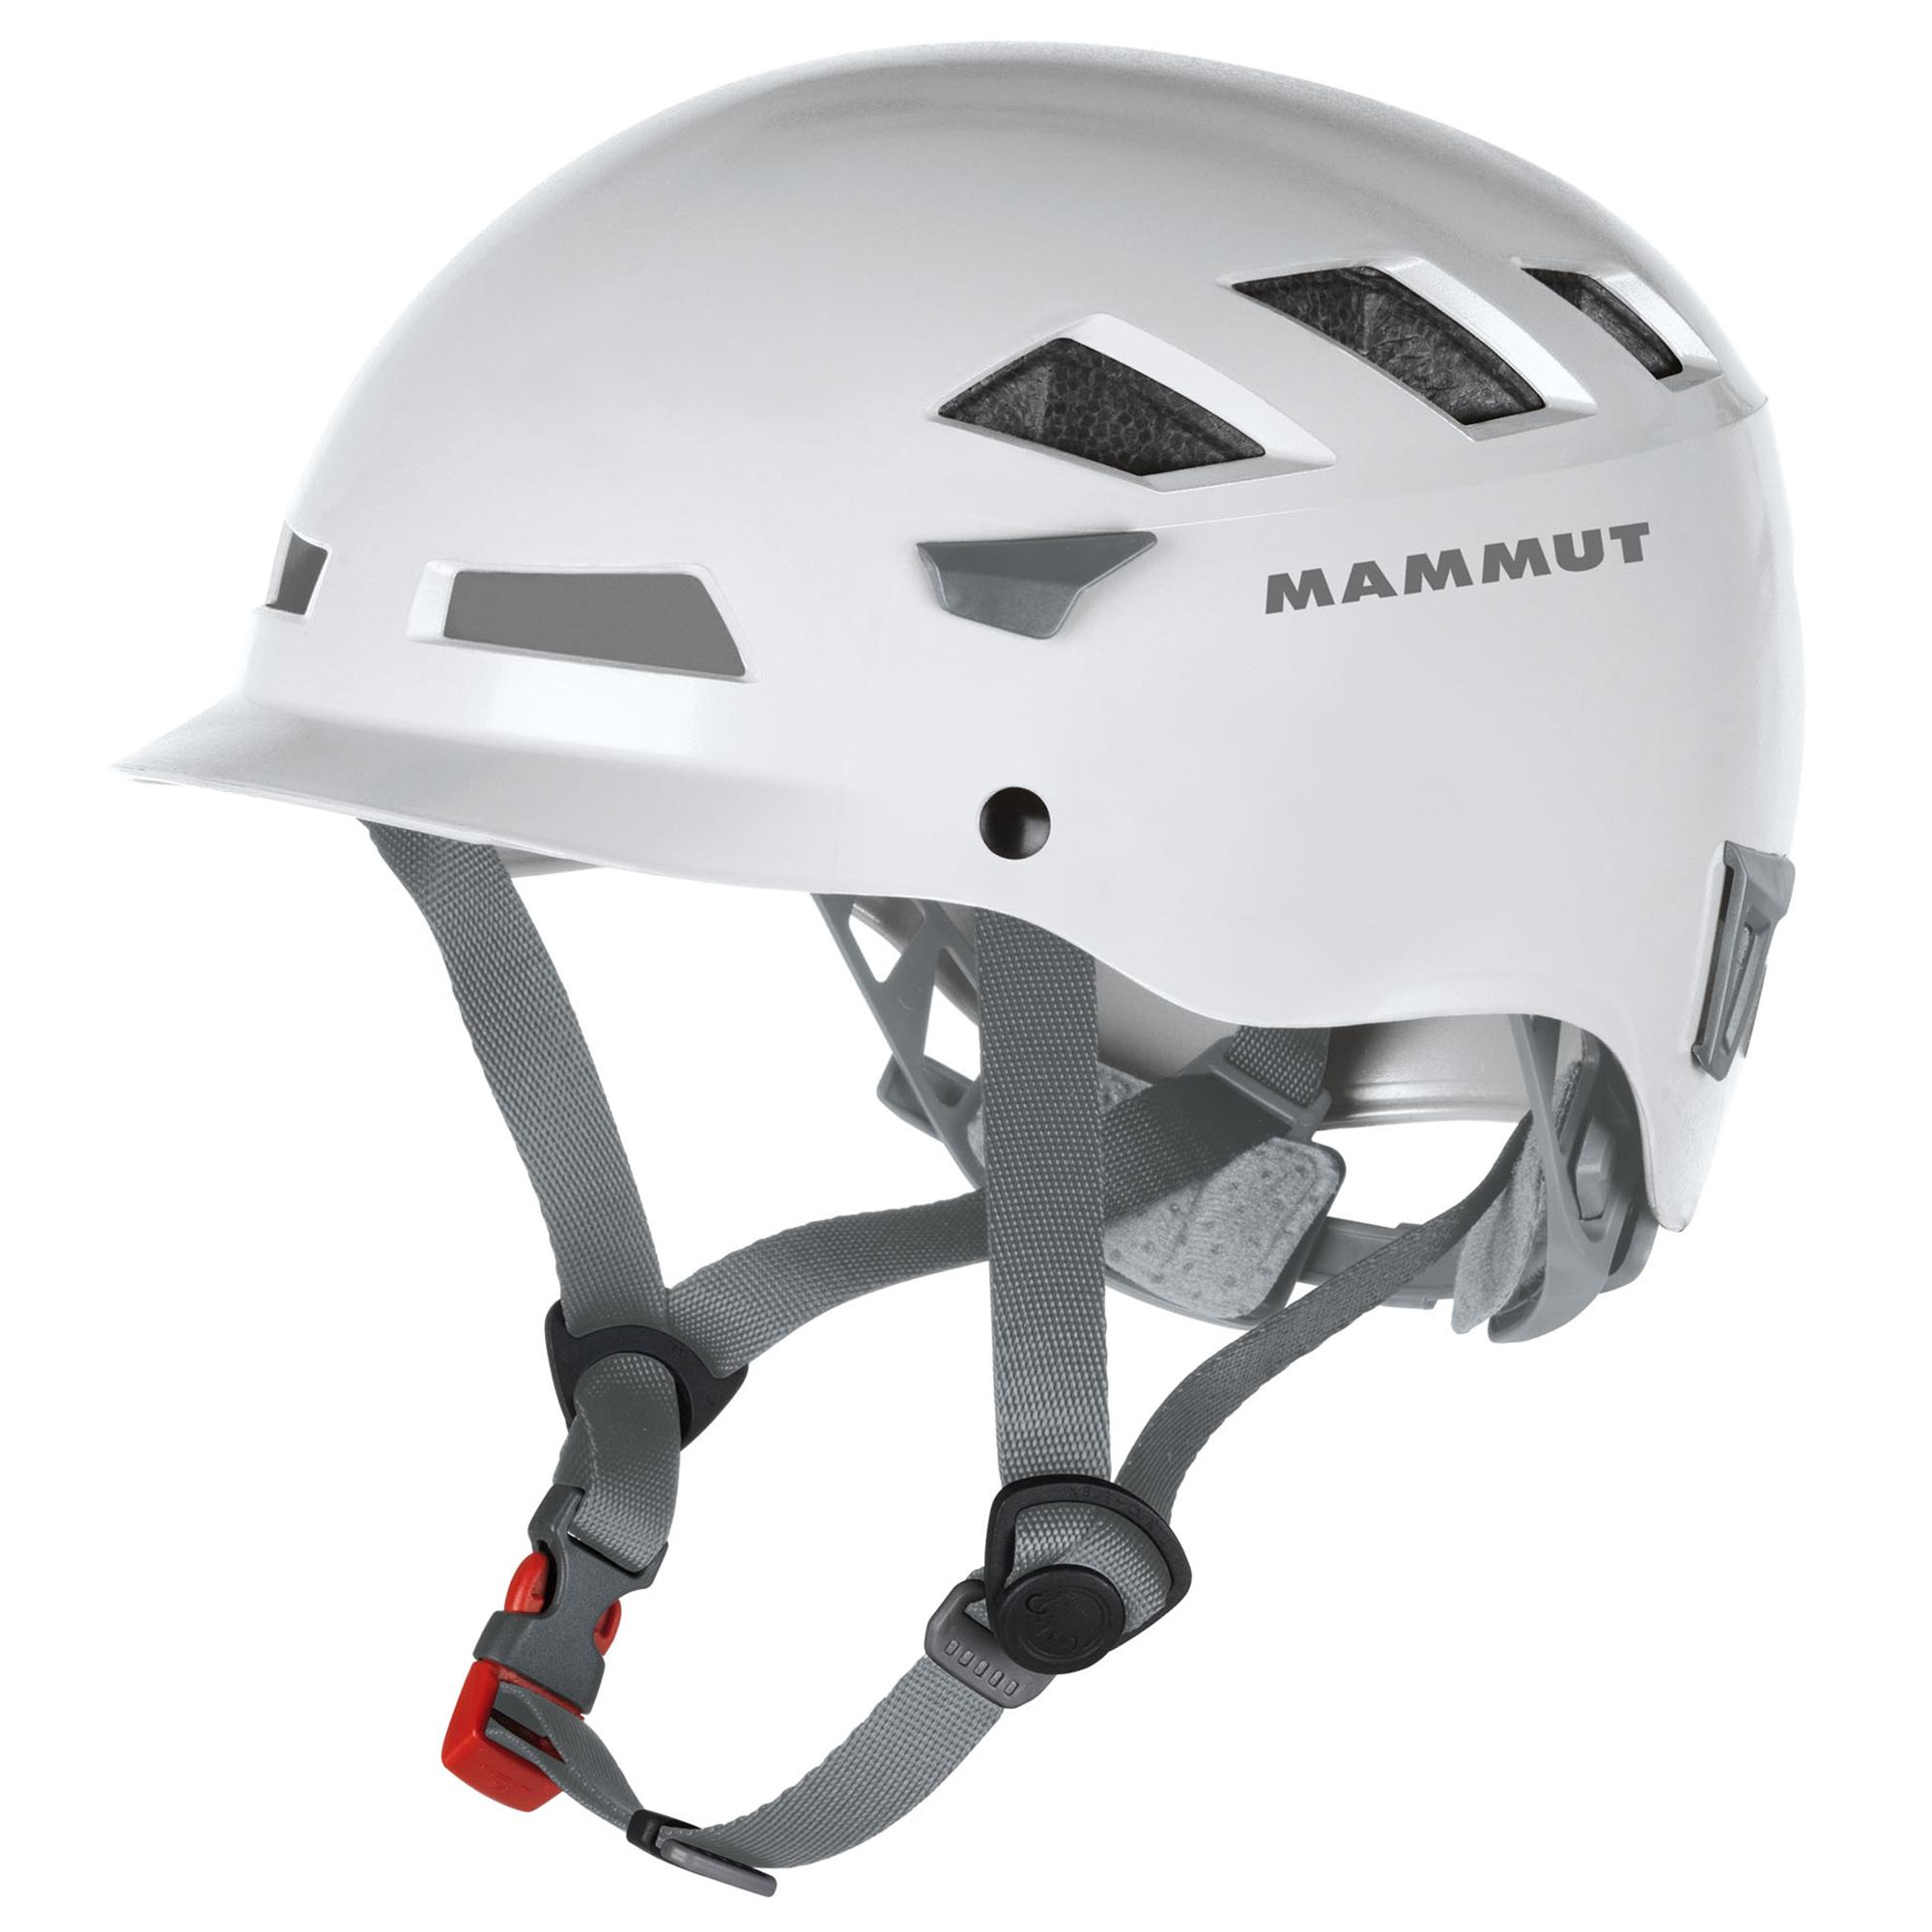 Climbing Helmet Mammut El Cap white-iron